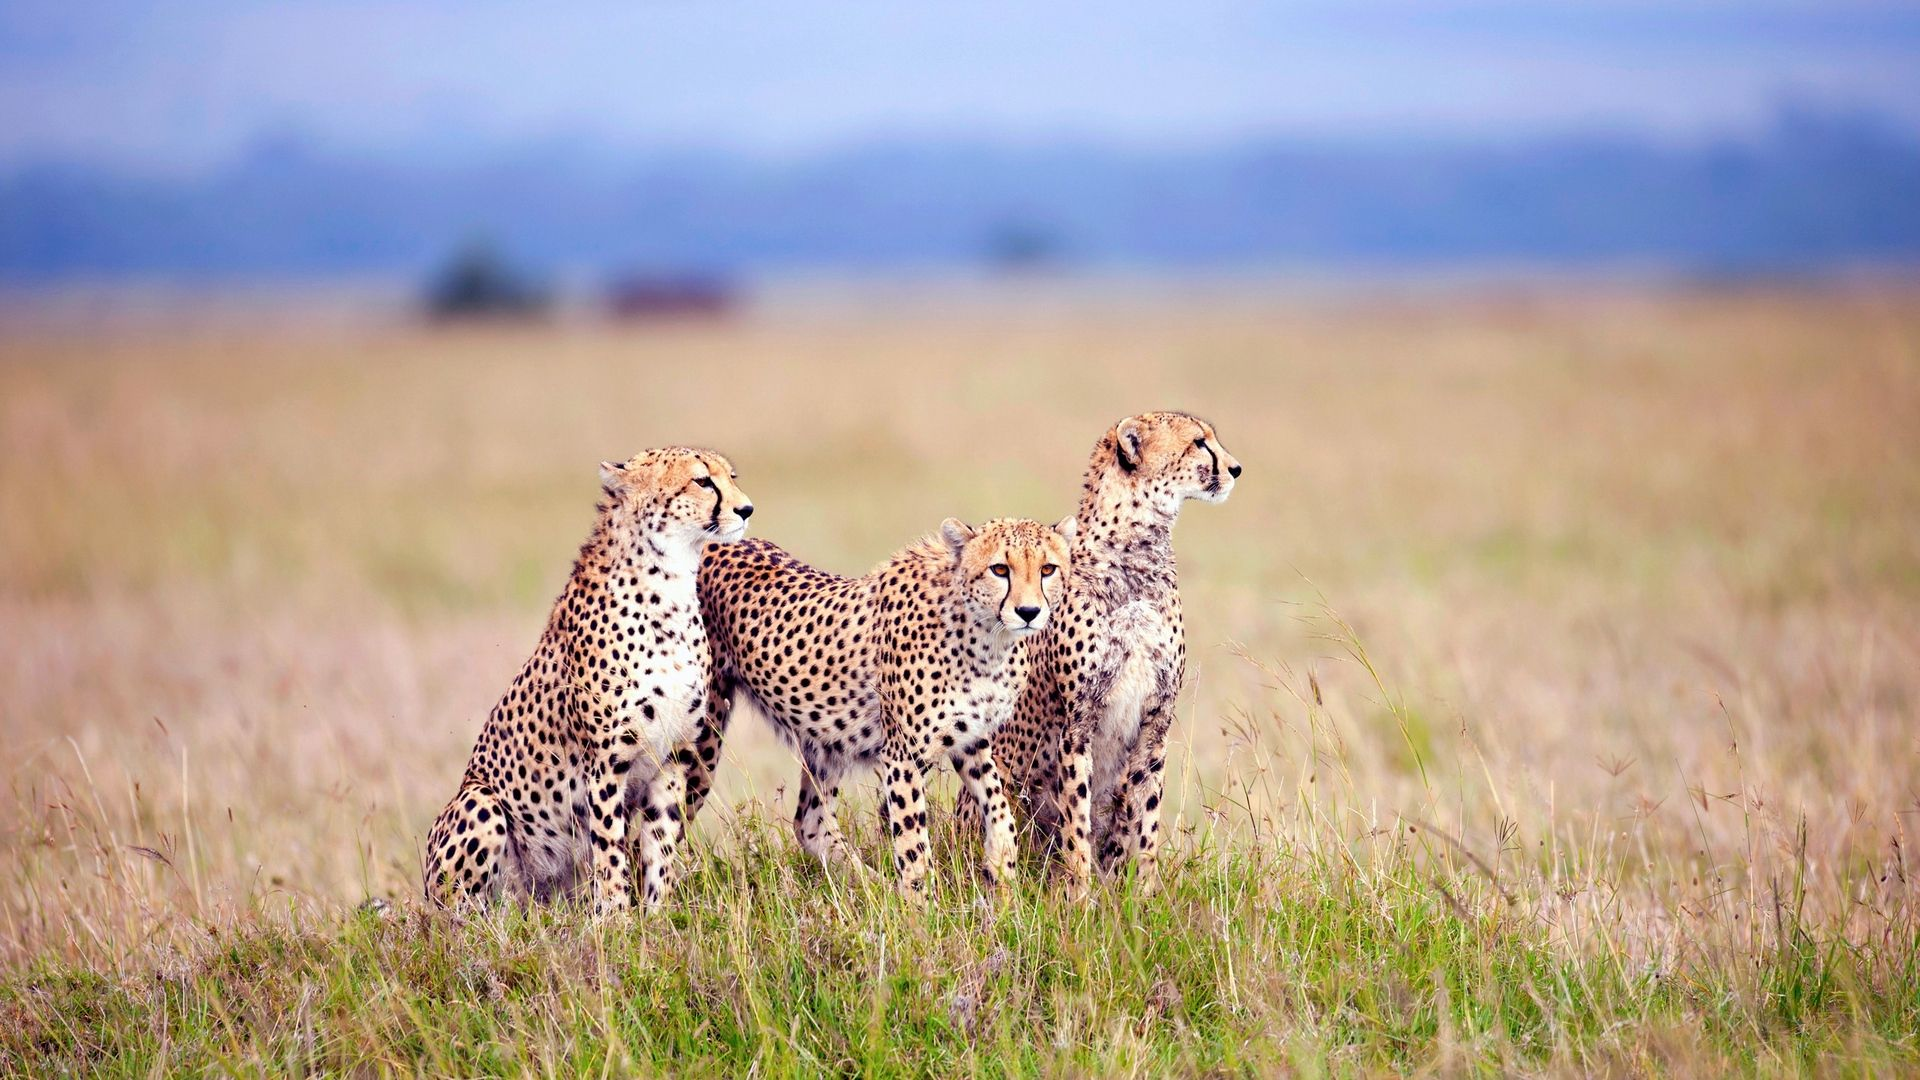 Downloadcheetahs, Field, Grass, Three, Predators Wallpaper, Back